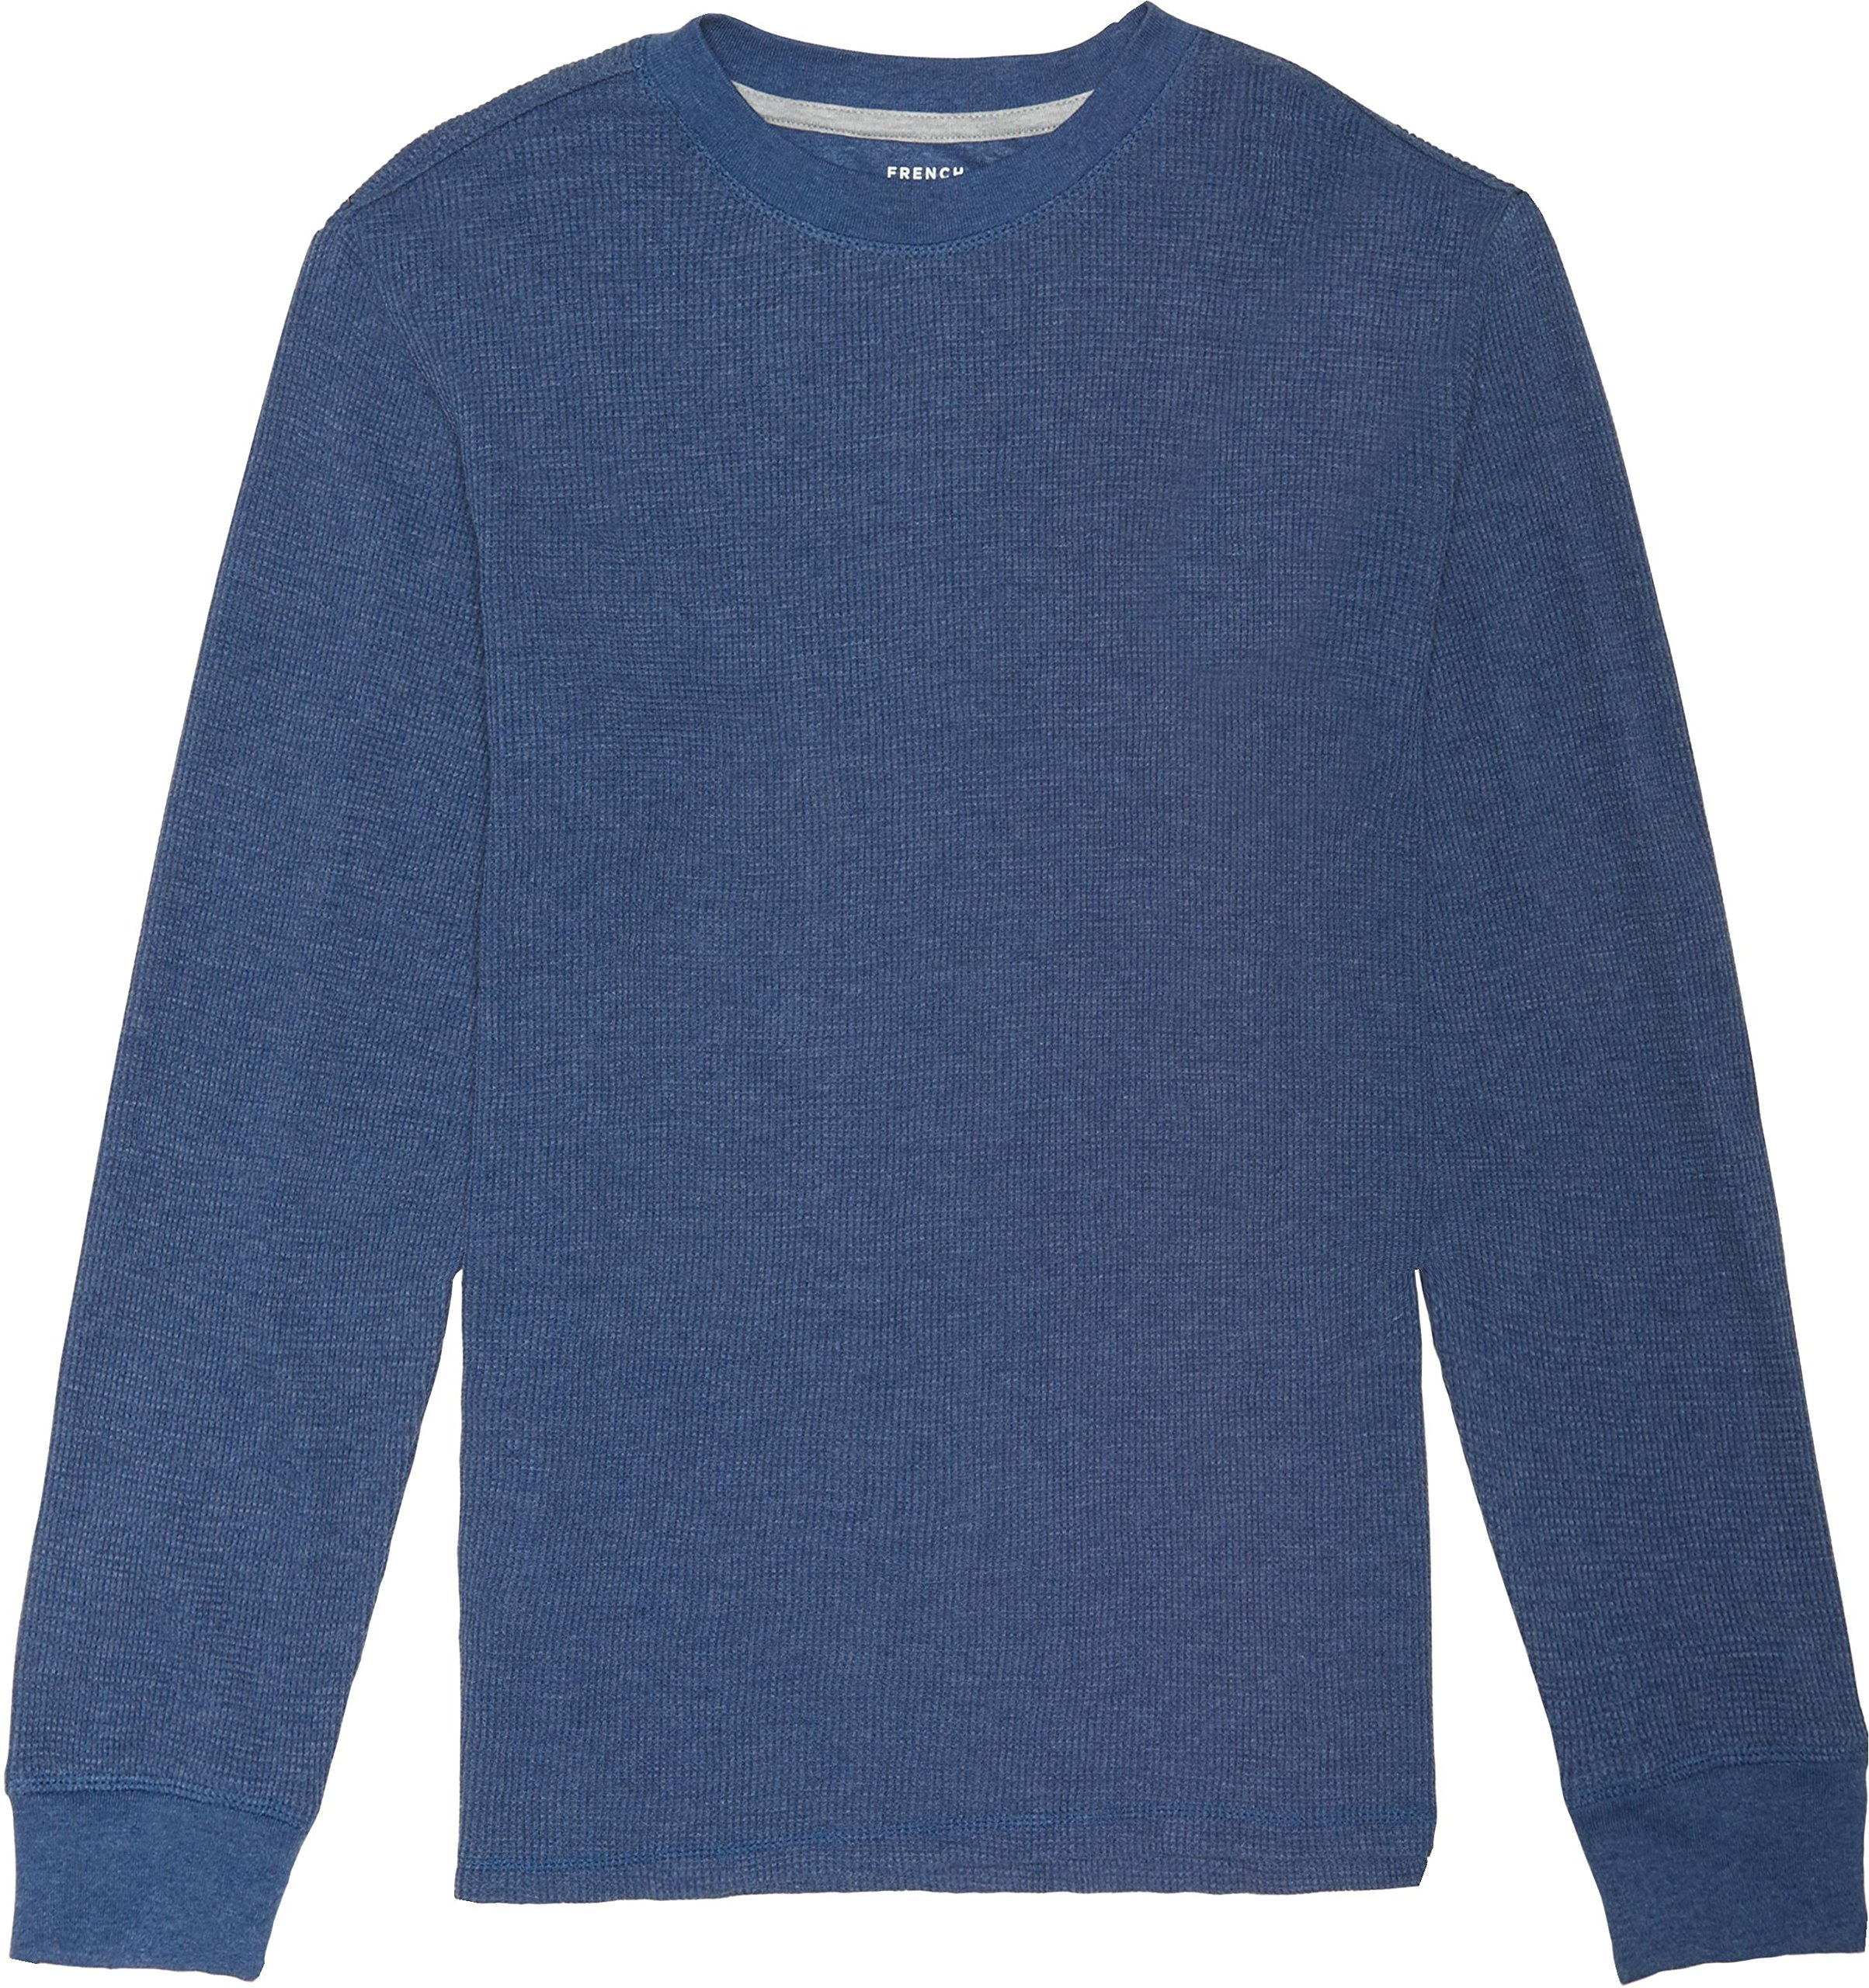 French Toast School Uniform Boys Long Sleeve Thermal T-Shirt, Medium Indigo Heather, Large (10/12)